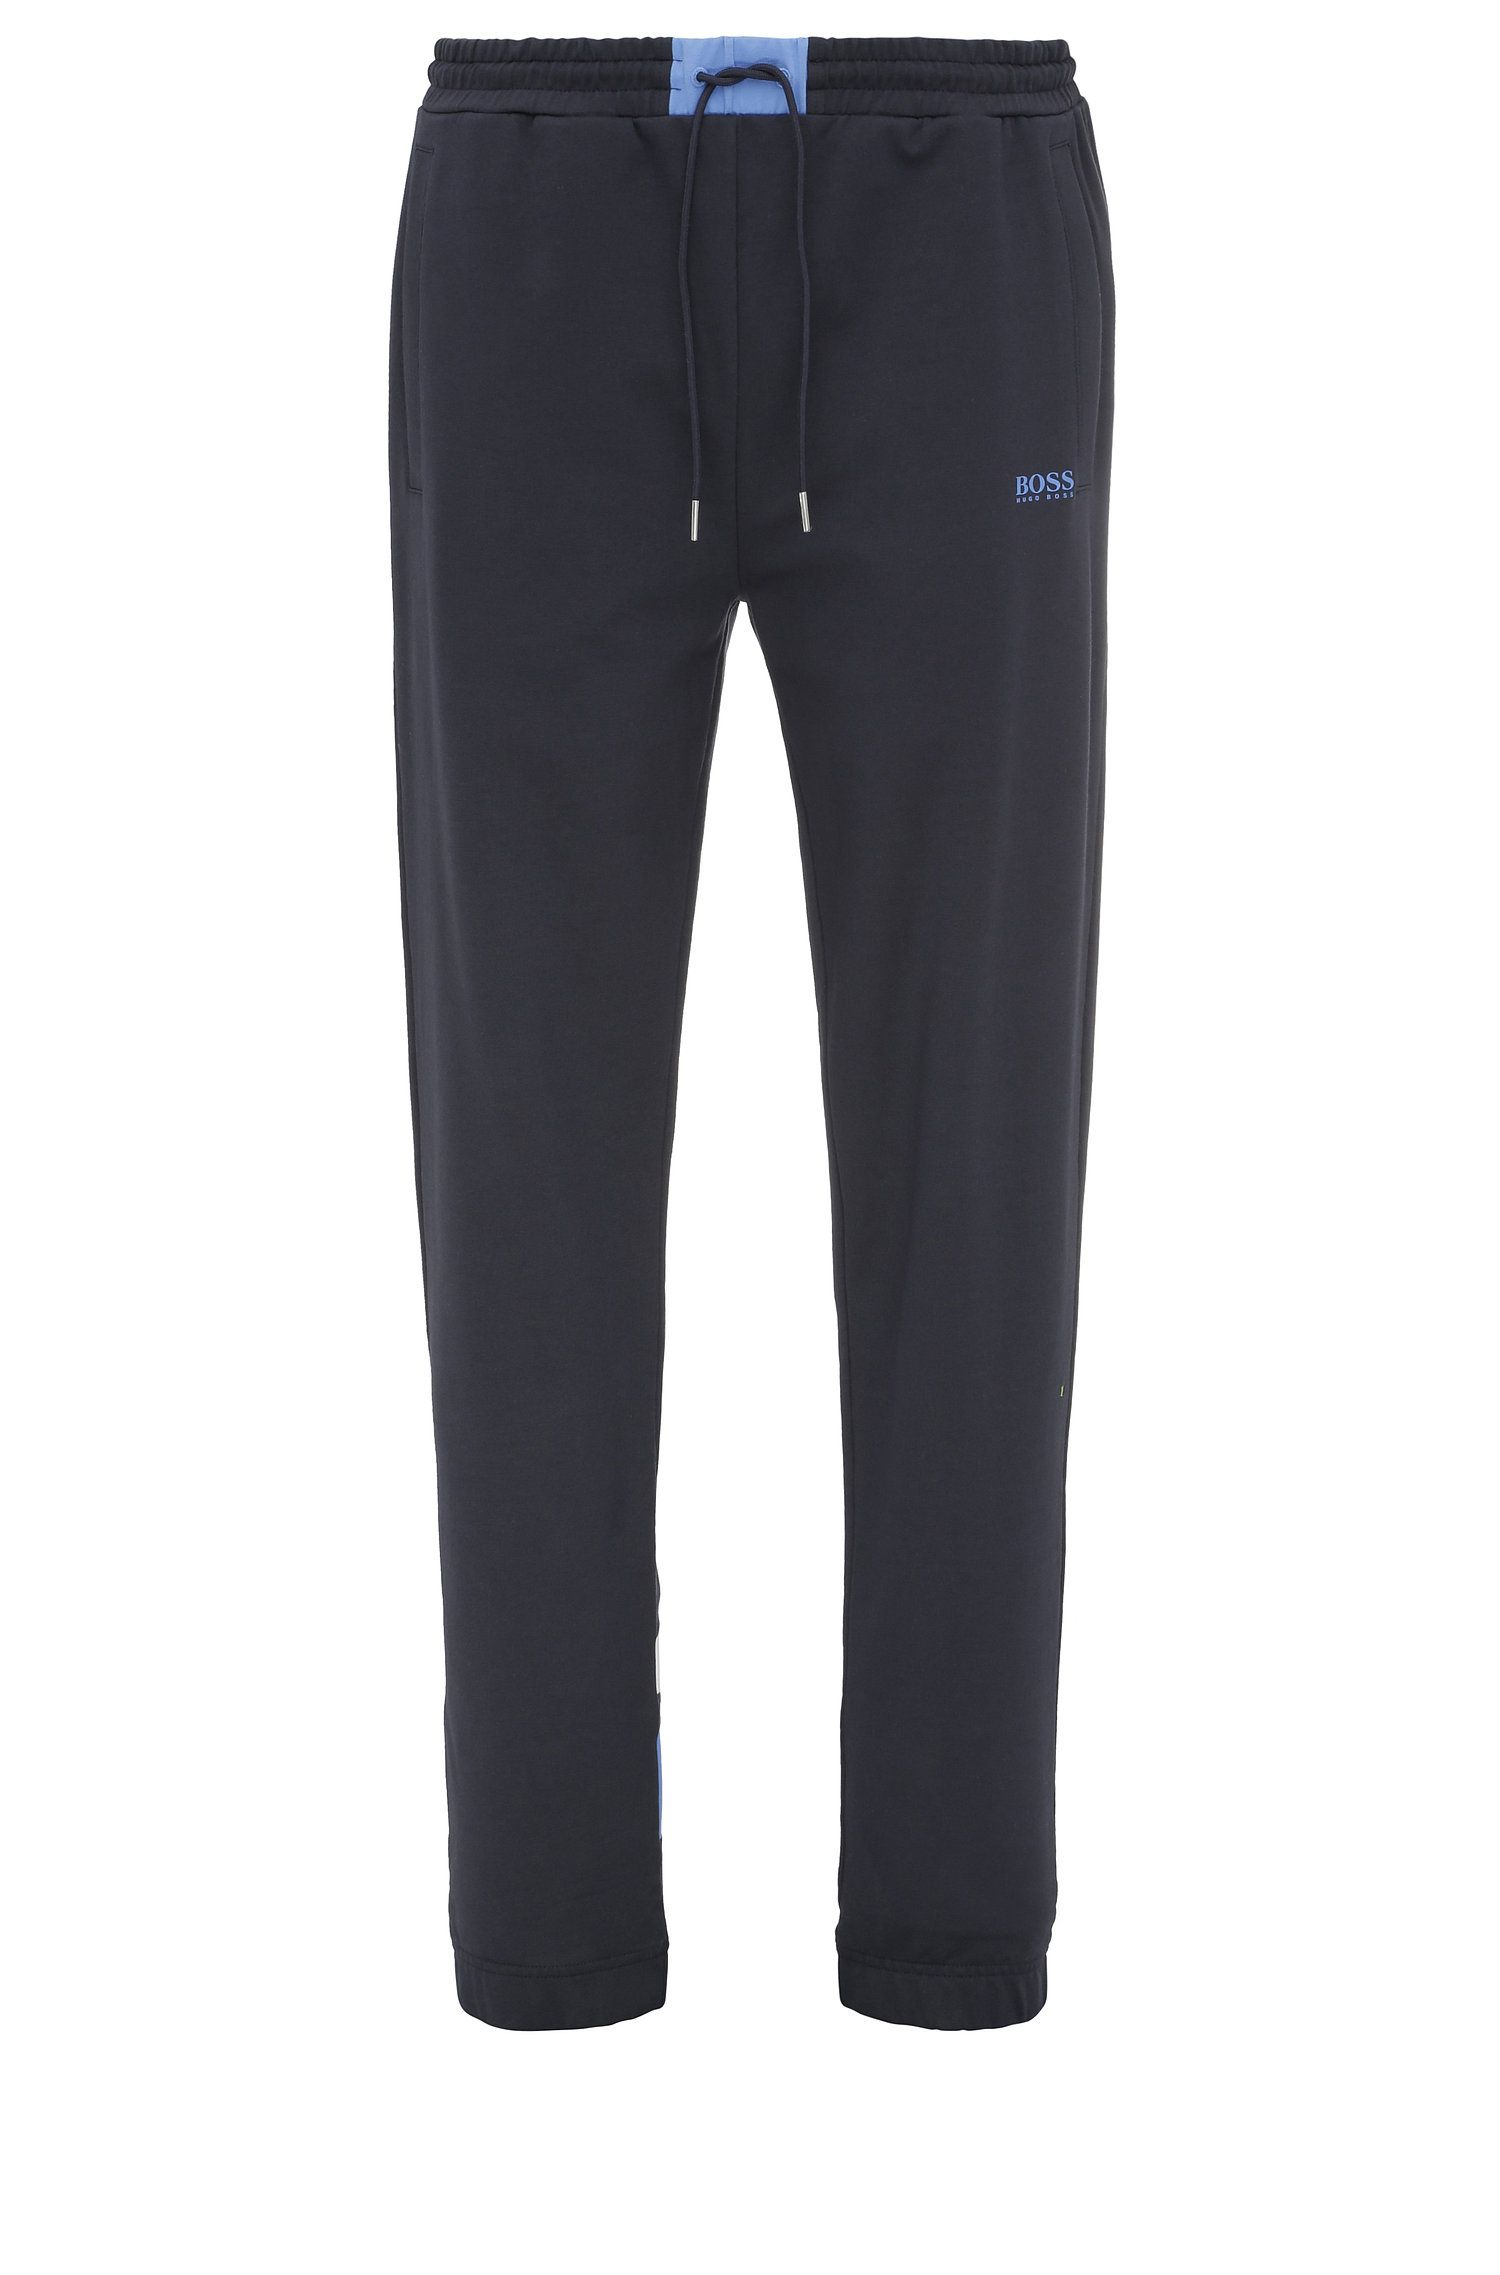 'Halko' | Stretch Cotton Sweat Pants